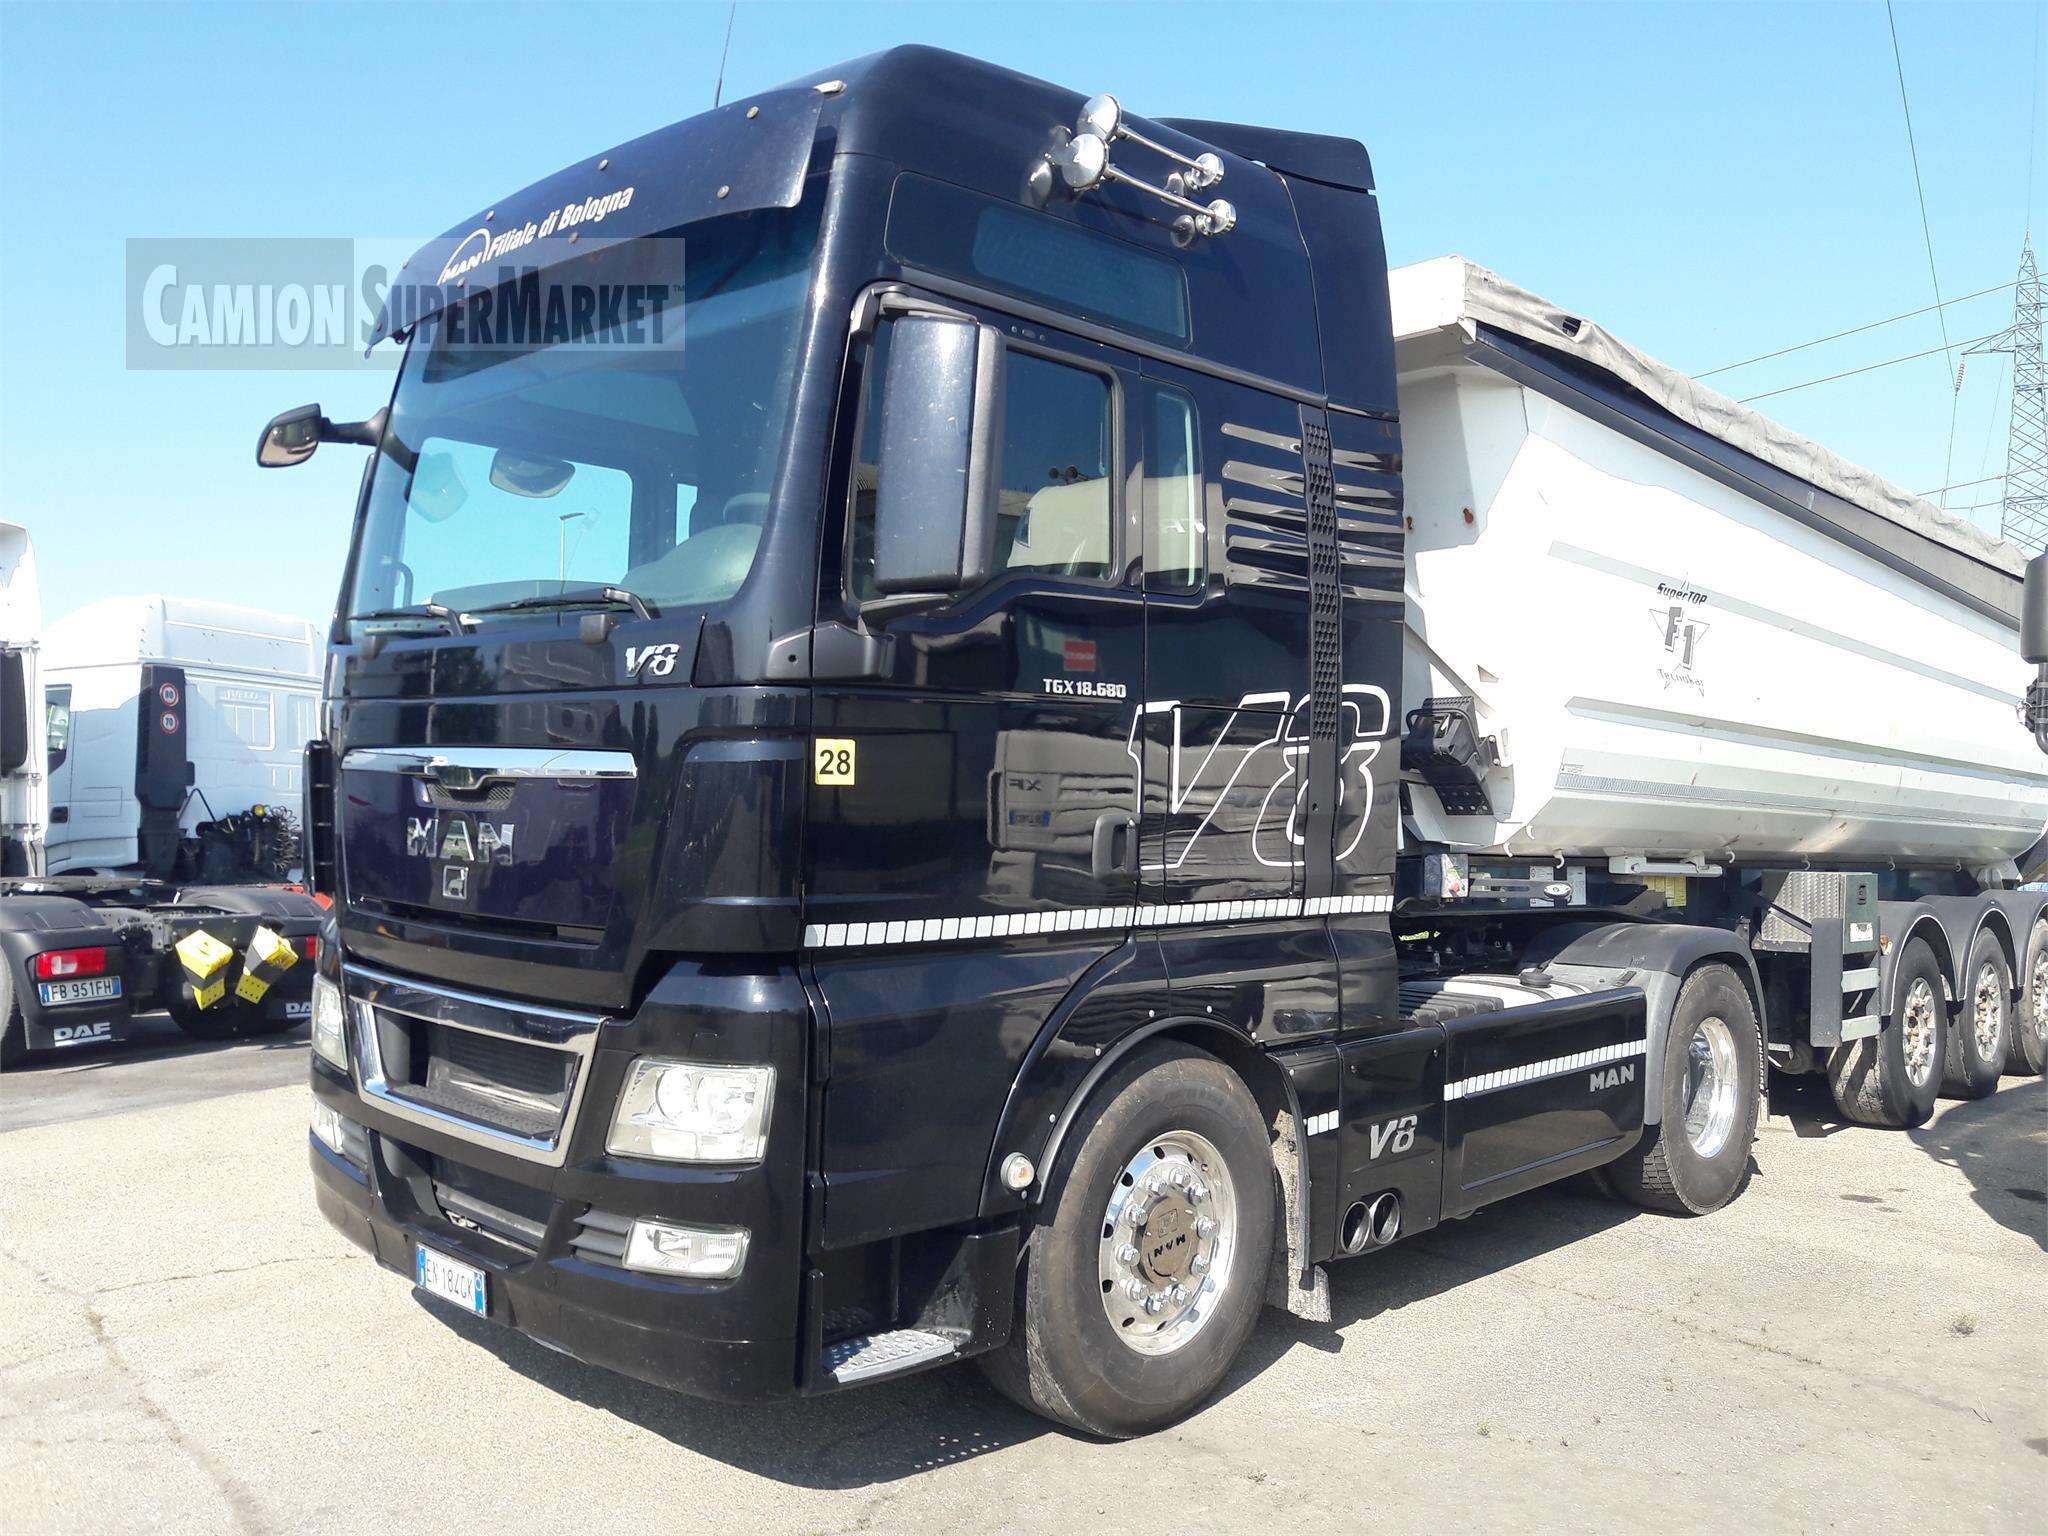 MAN TGX18.680 Usato 2012 Emilia-Romagna